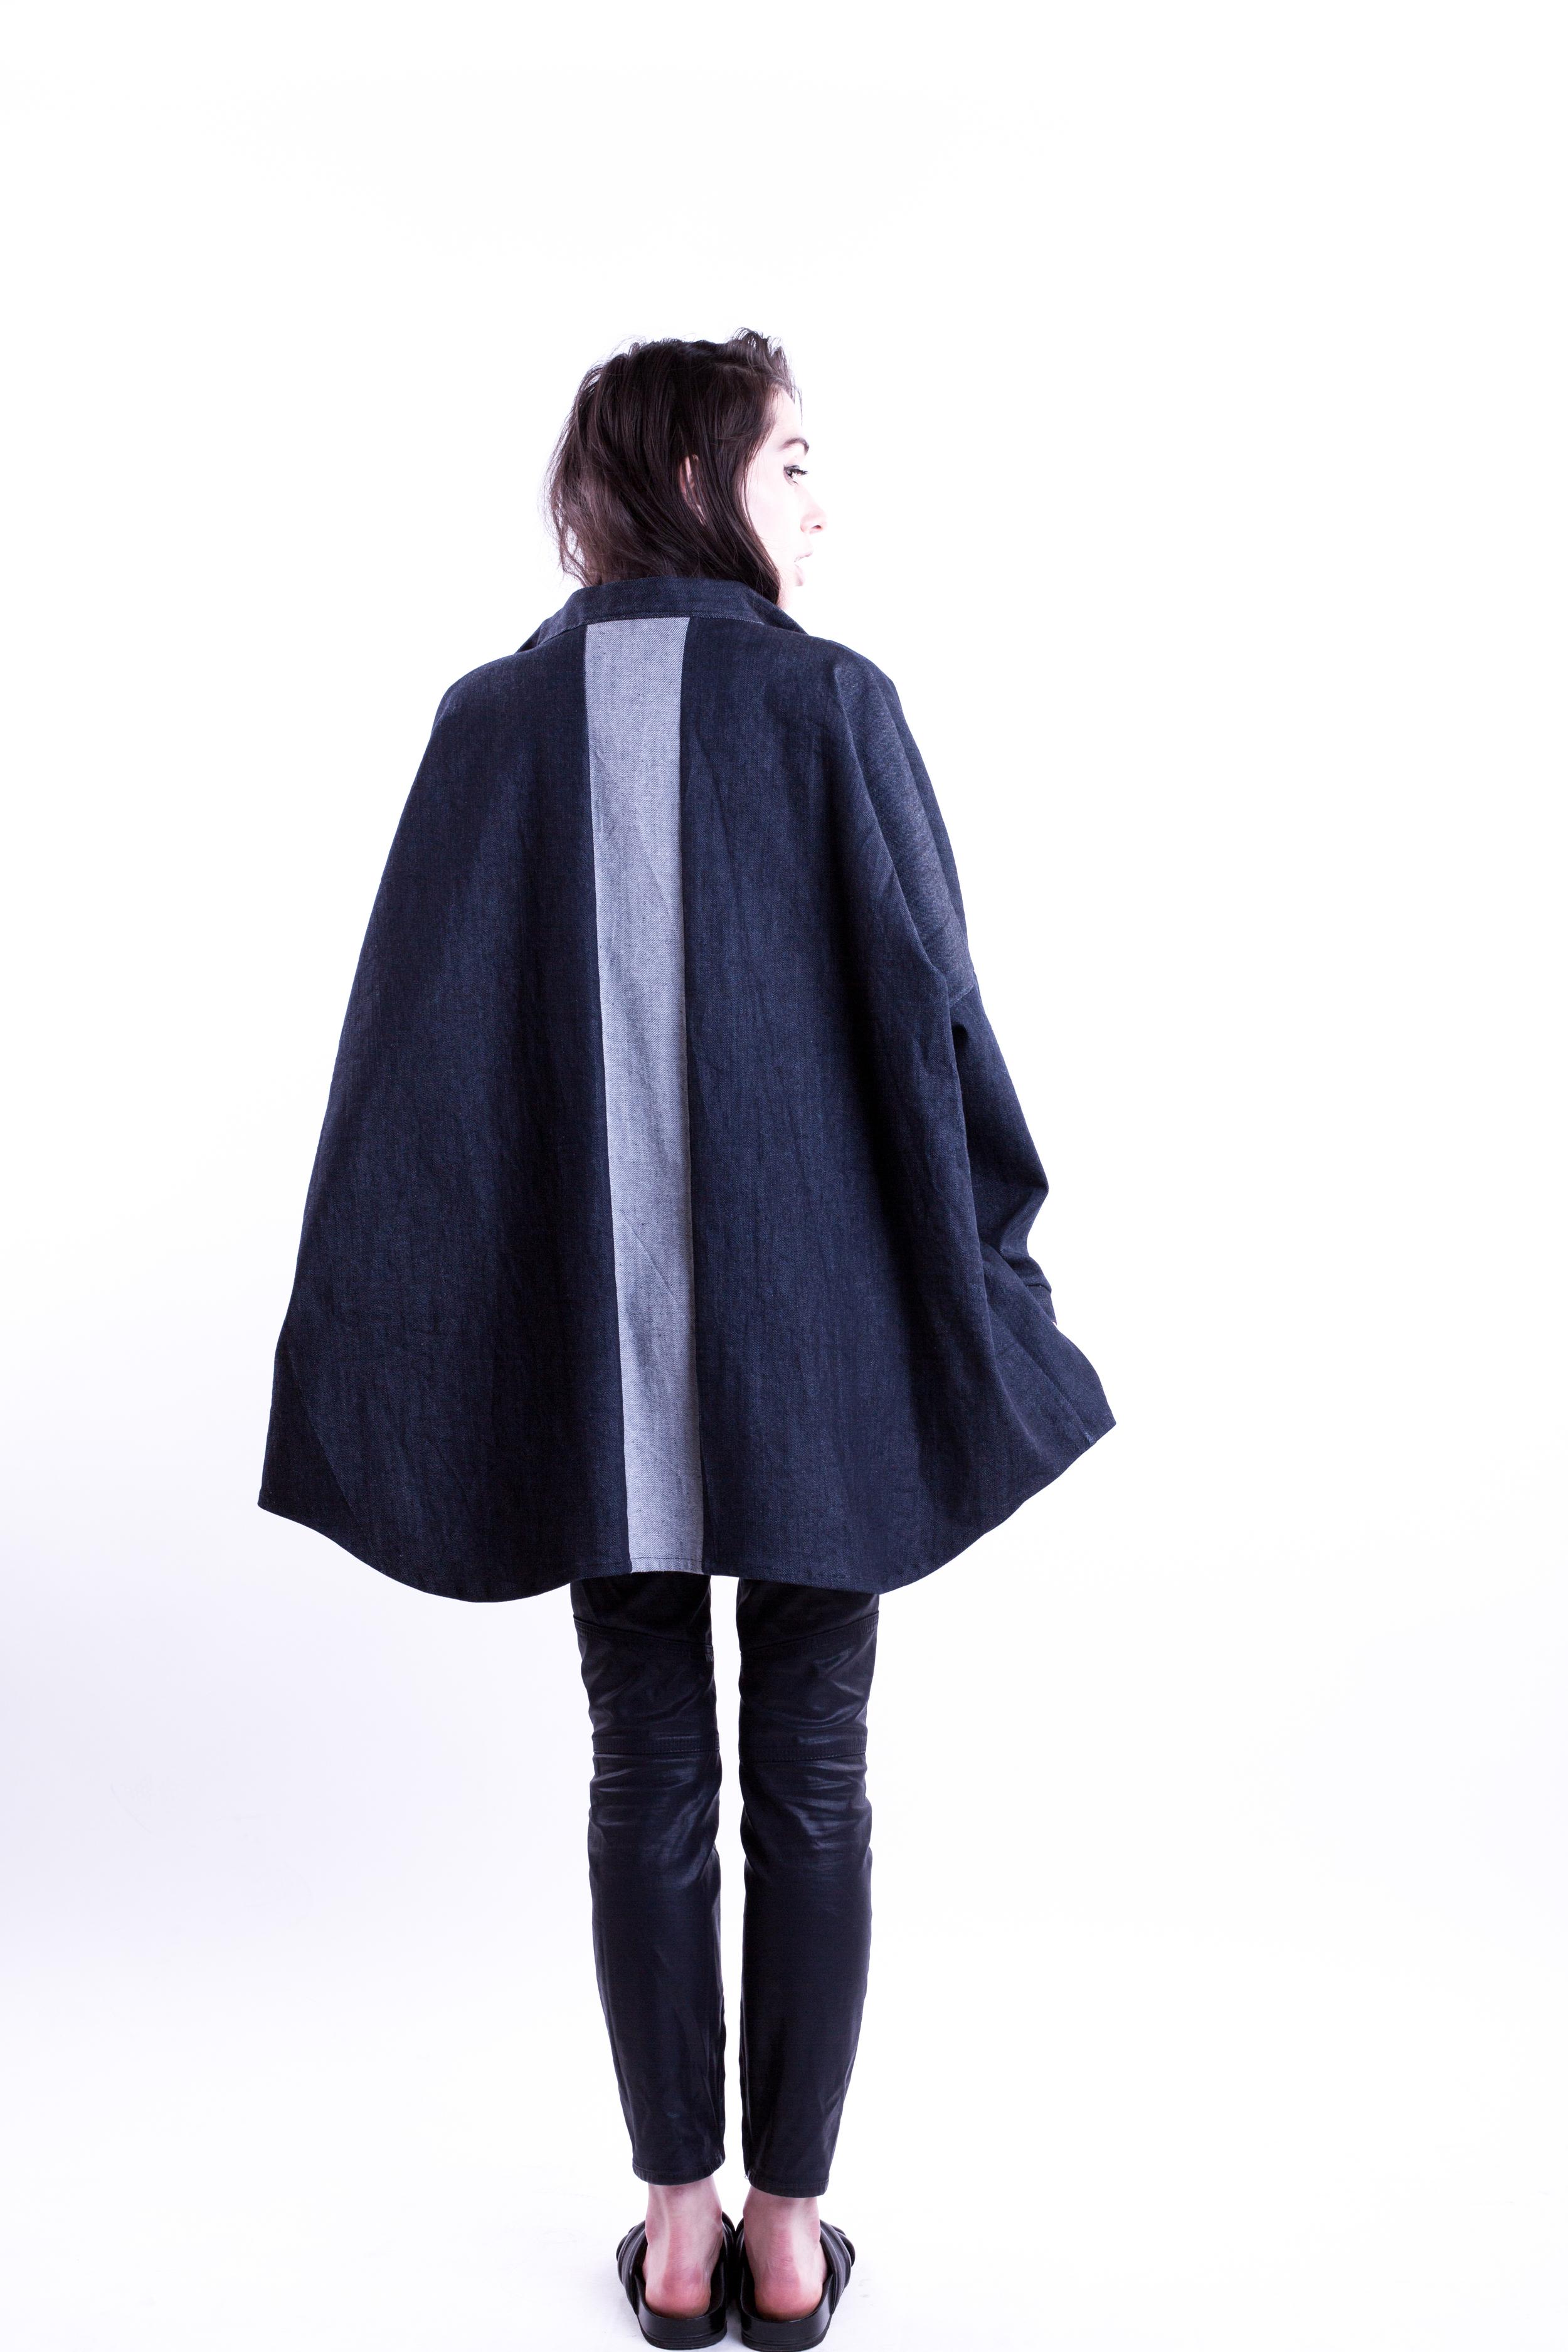 becca_jill_042_jacket_01.jpg